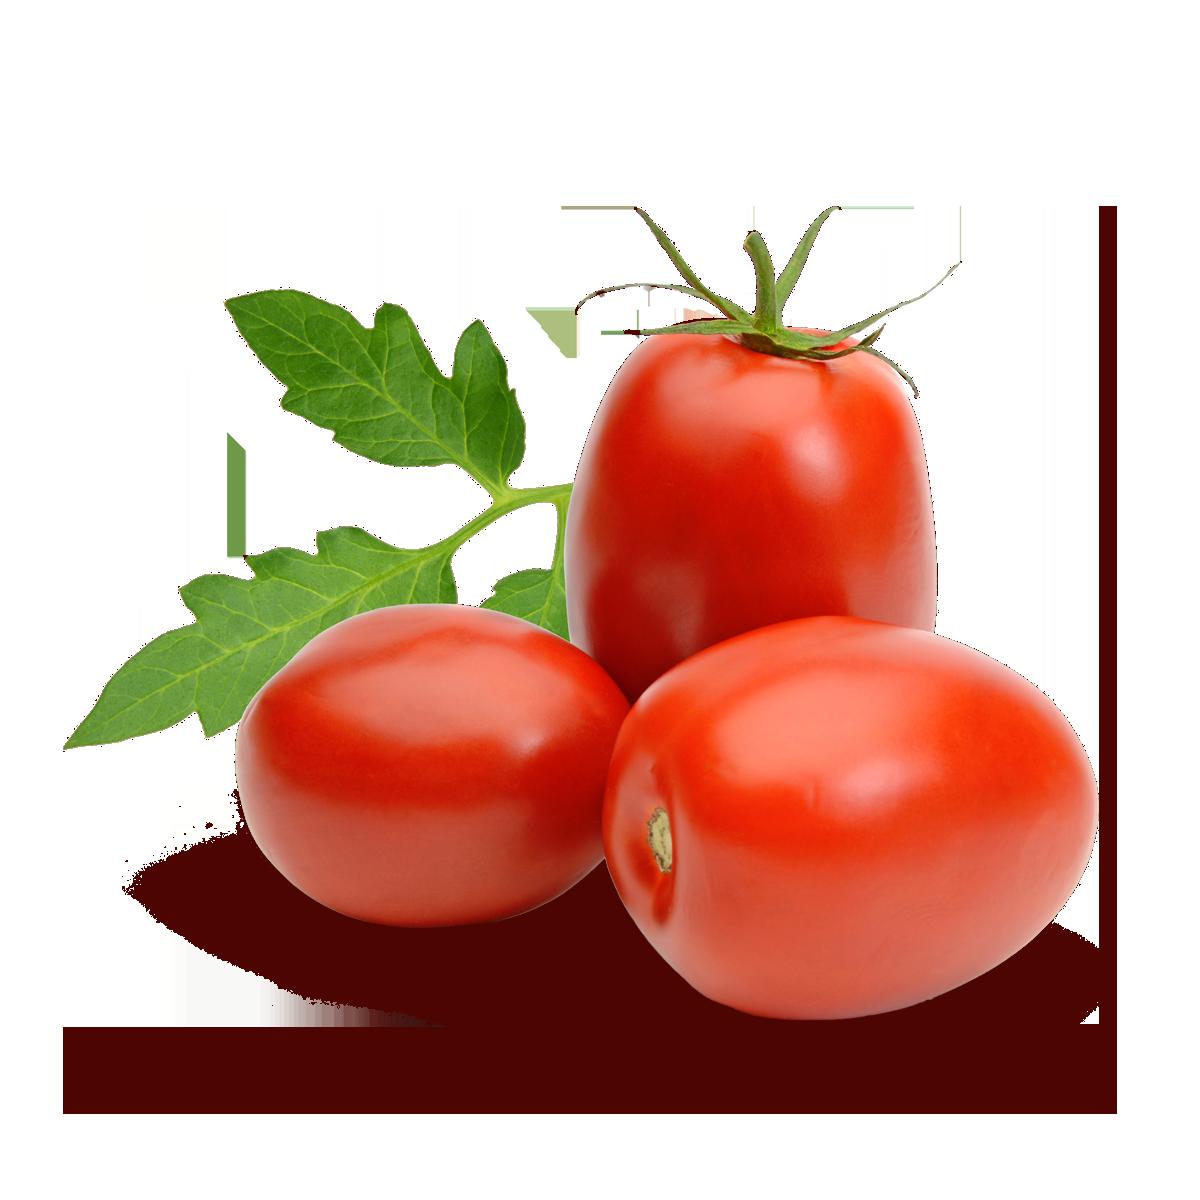 pomodori agricola fratepietro puglia olive bella di cerignola